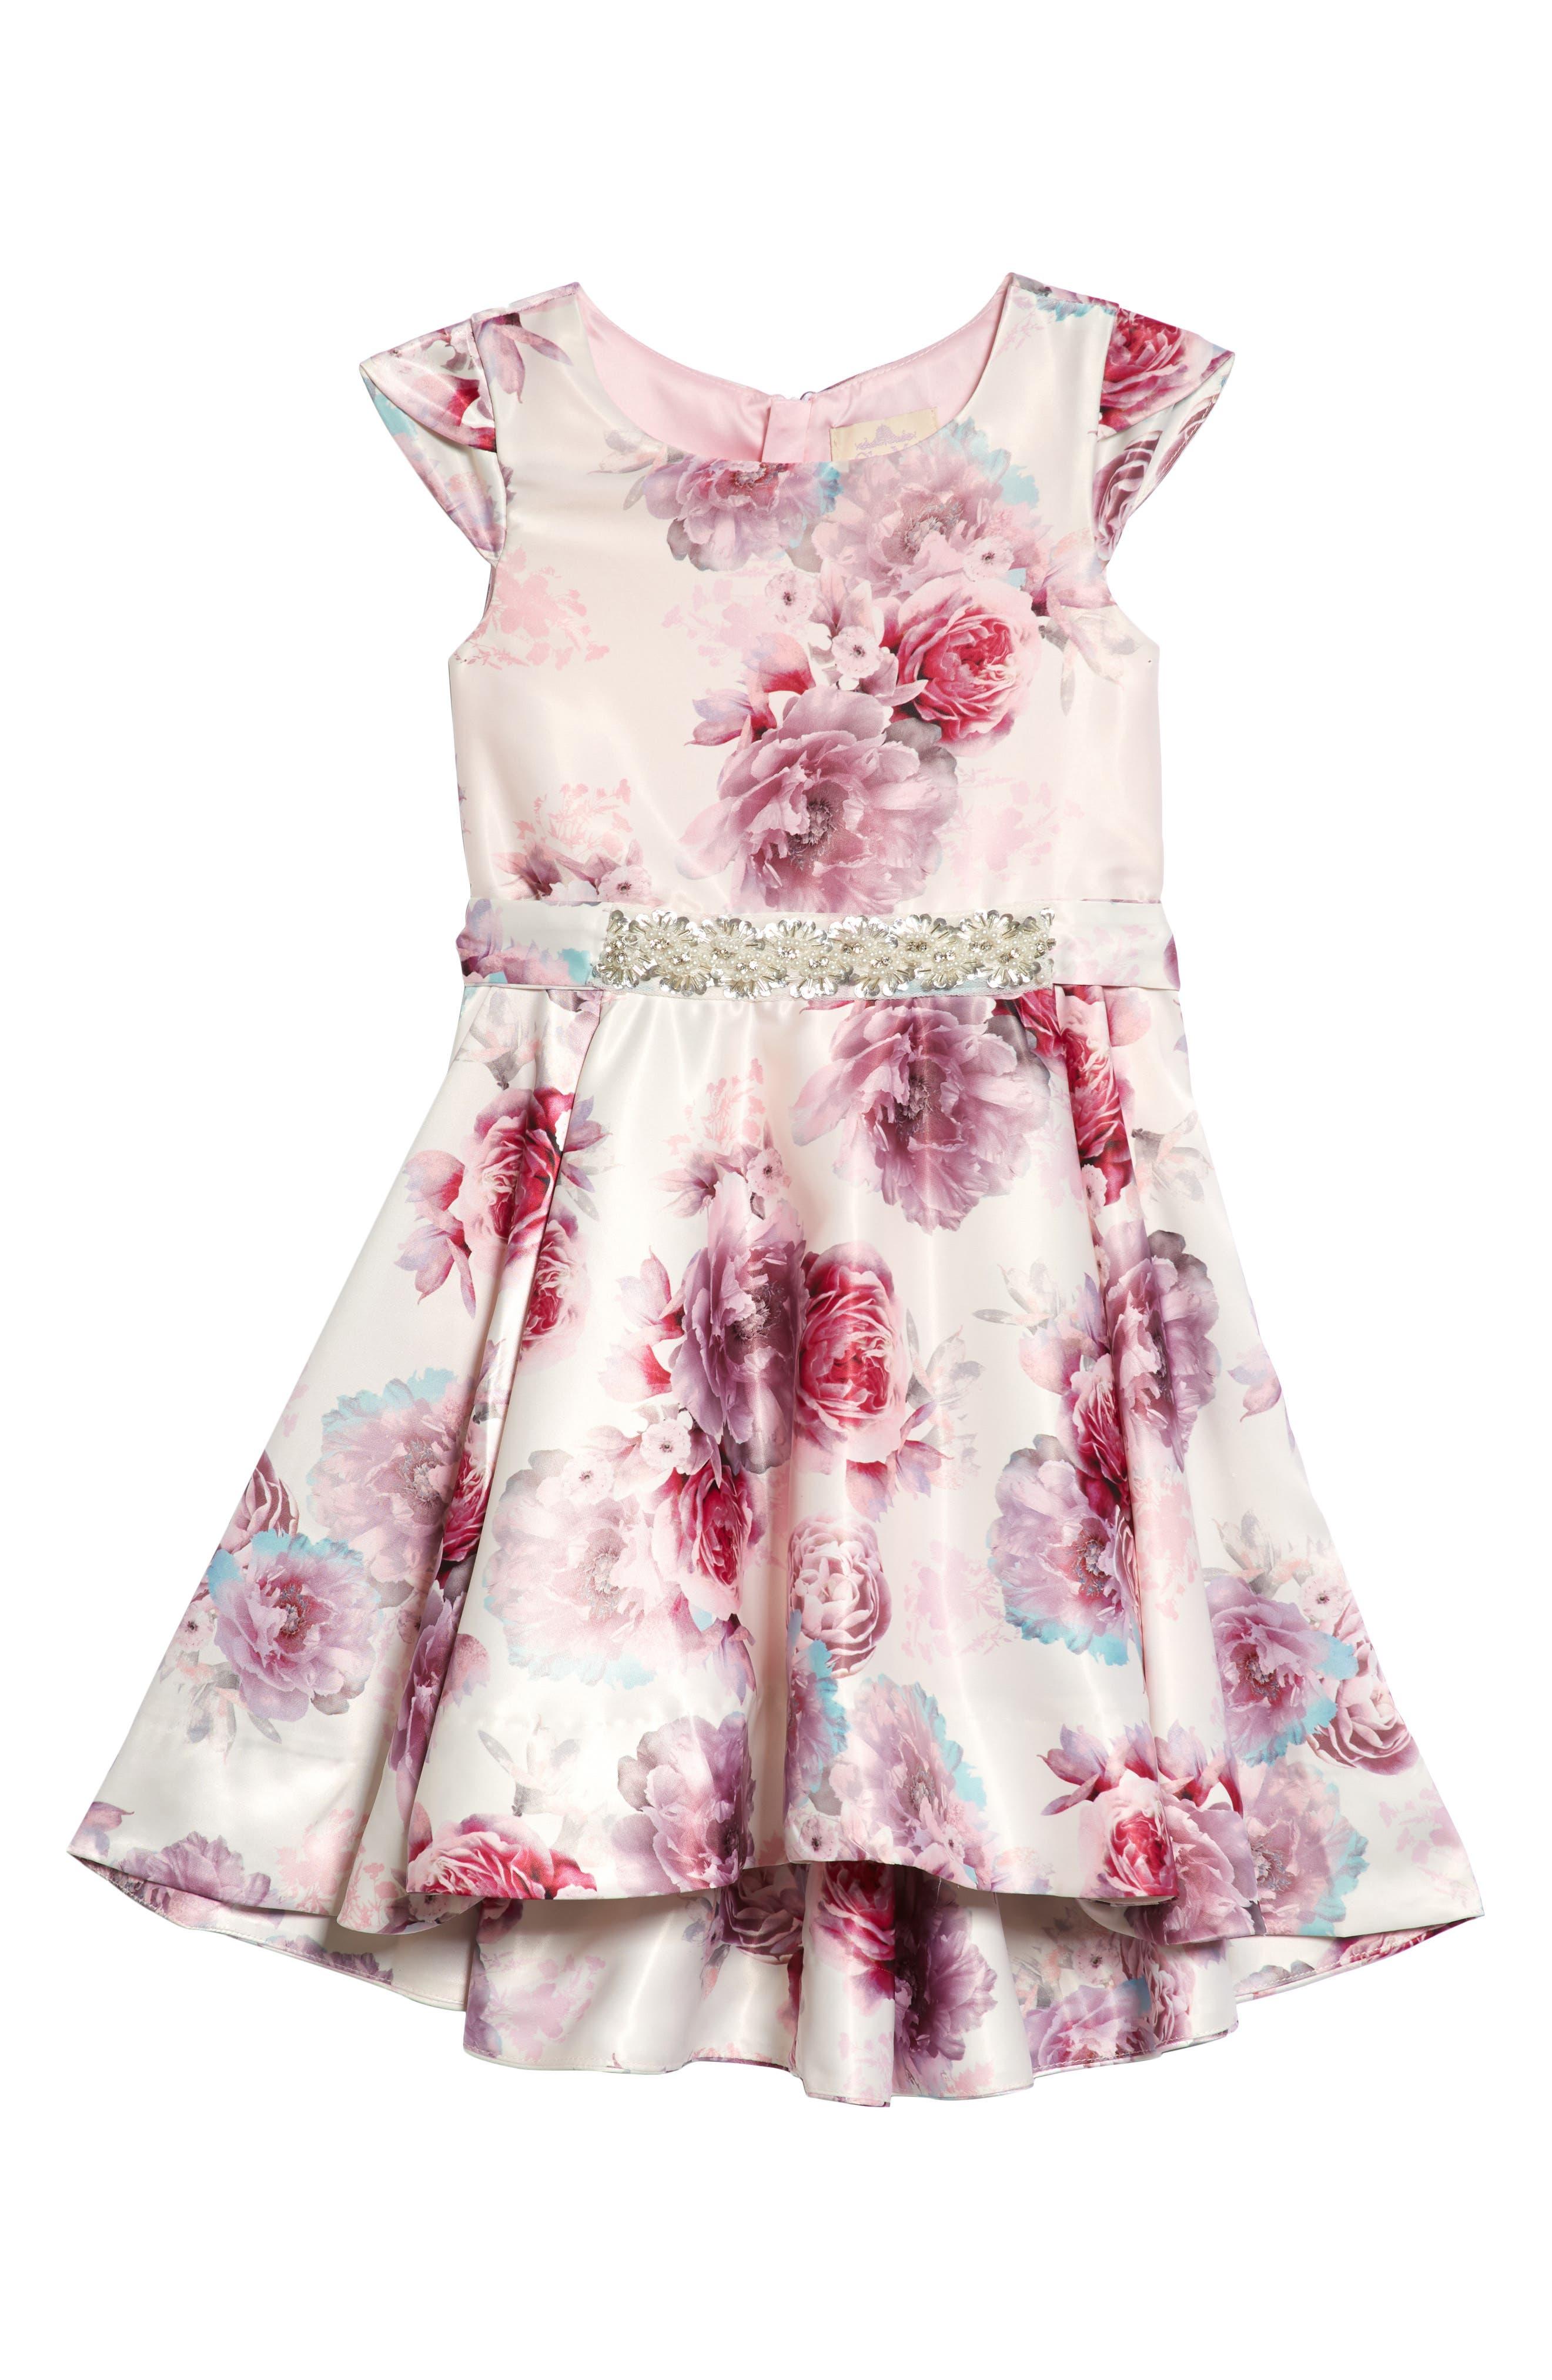 Ana Embellished Floral Dress,                             Main thumbnail 1, color,                             600